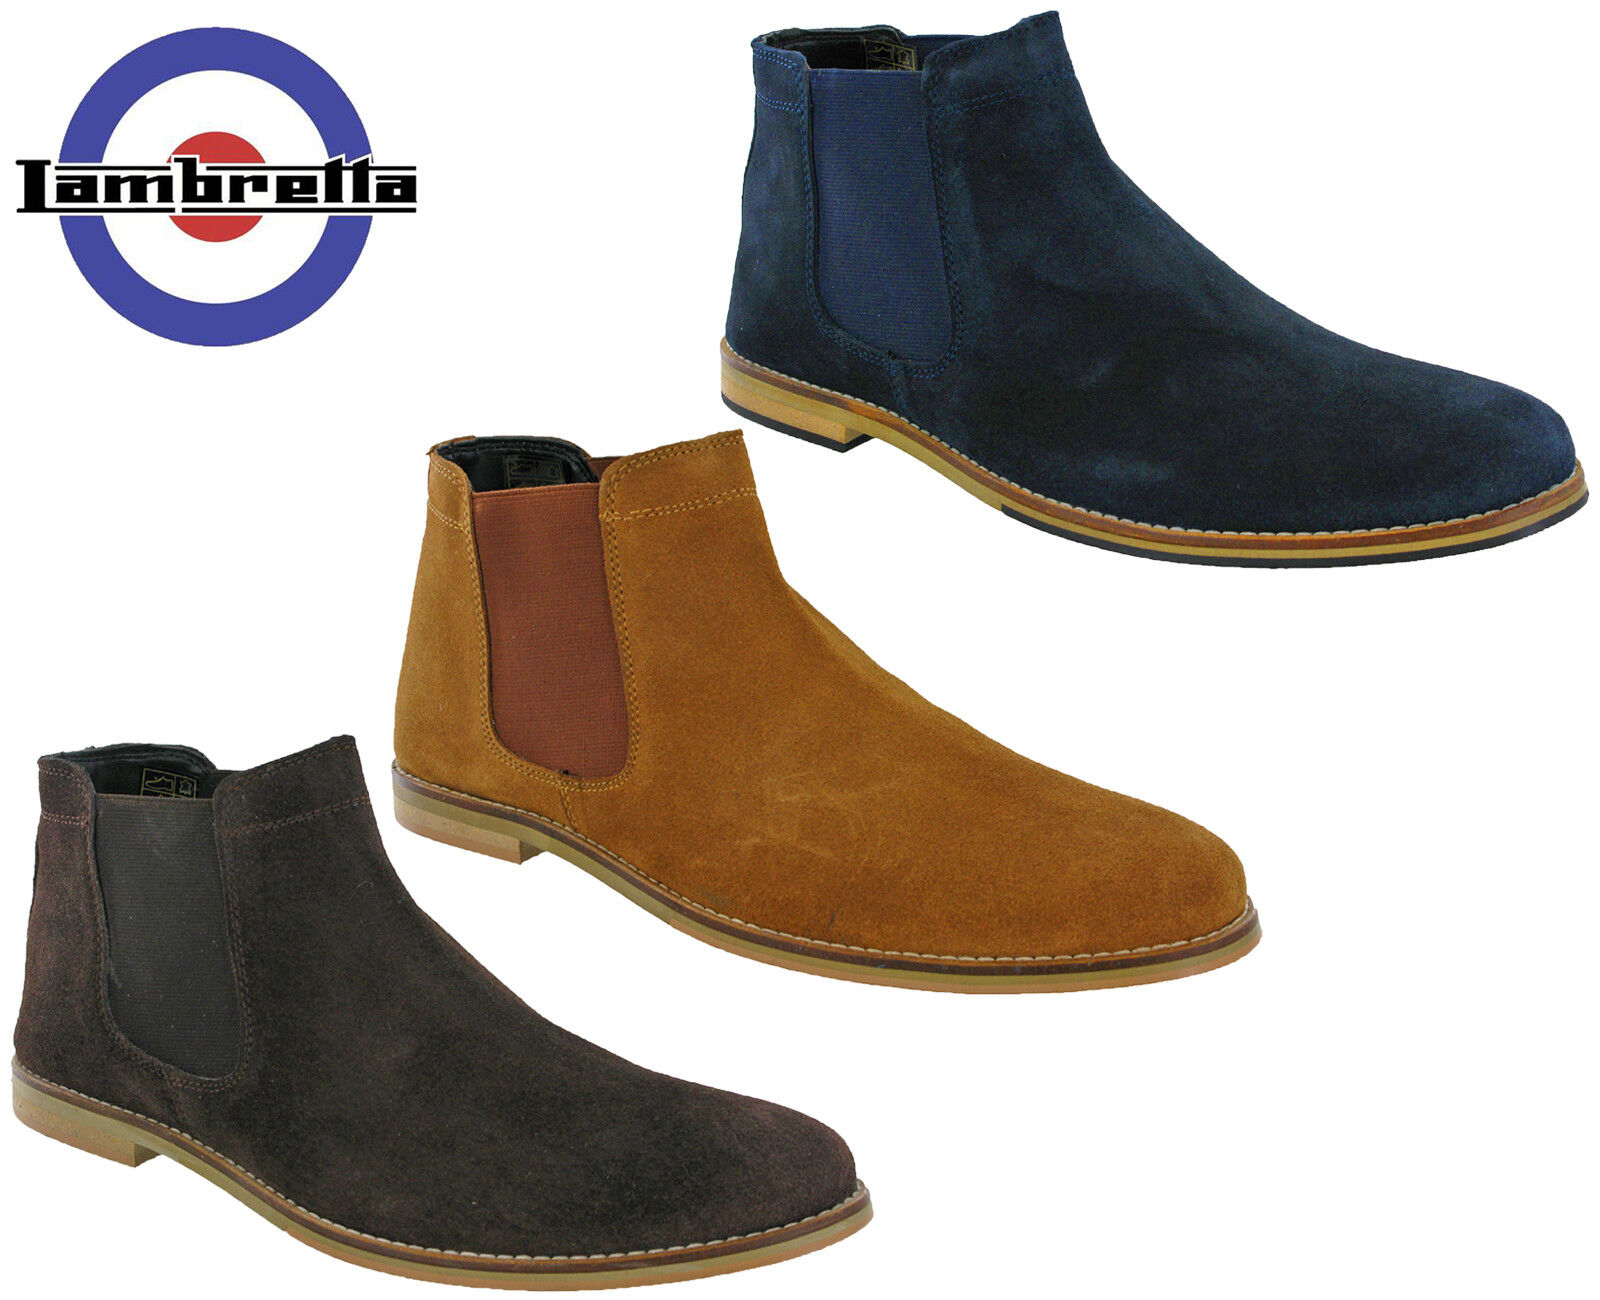 Lambretta Desert Boots Chelsea Leather Suede Mens Flat Fashion MOD Jackson